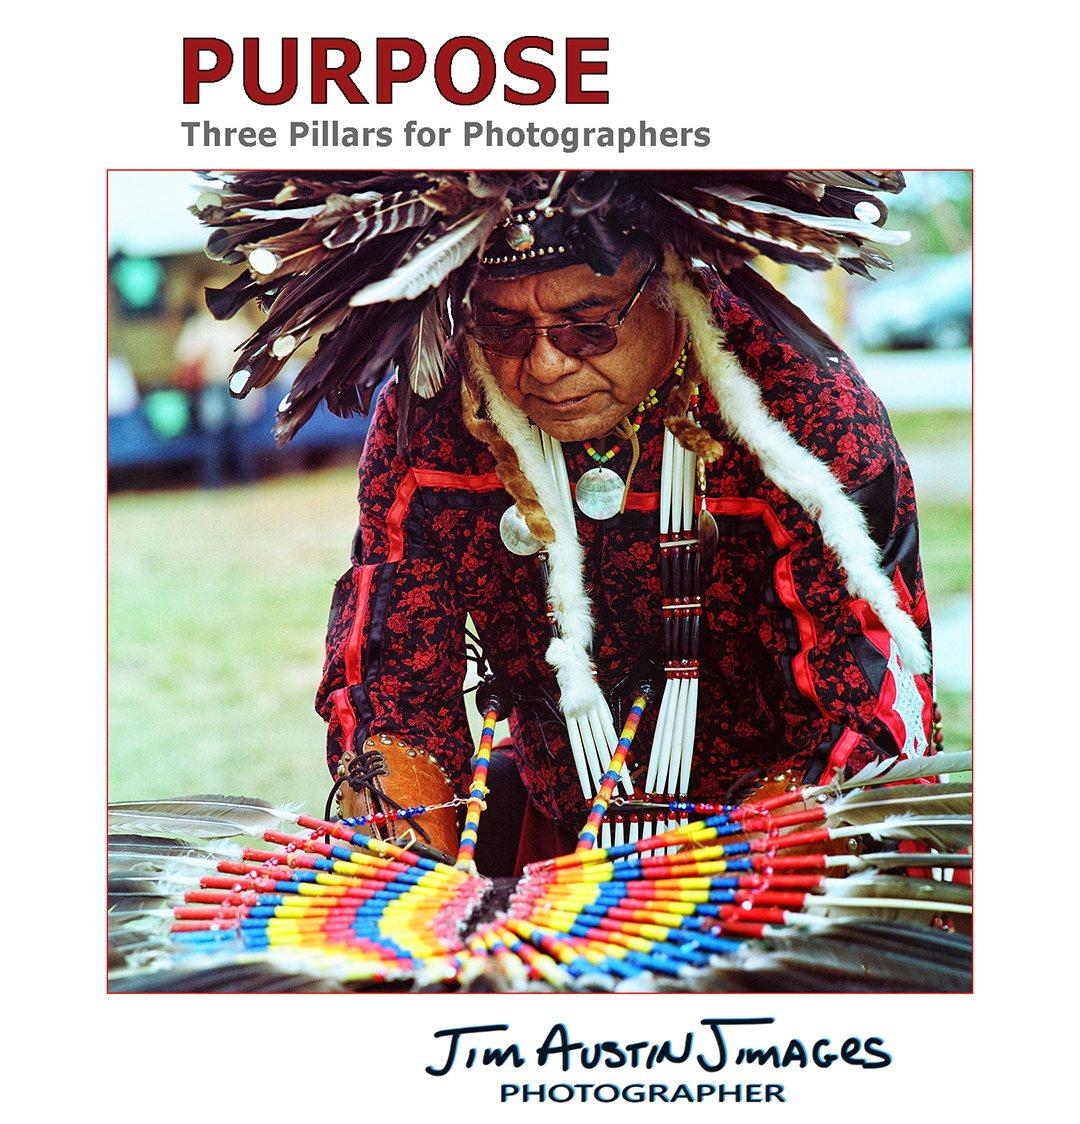 Making Headress Dancer Native Rhythms Bronica SQ Portra 160 Jim Austin Jimages